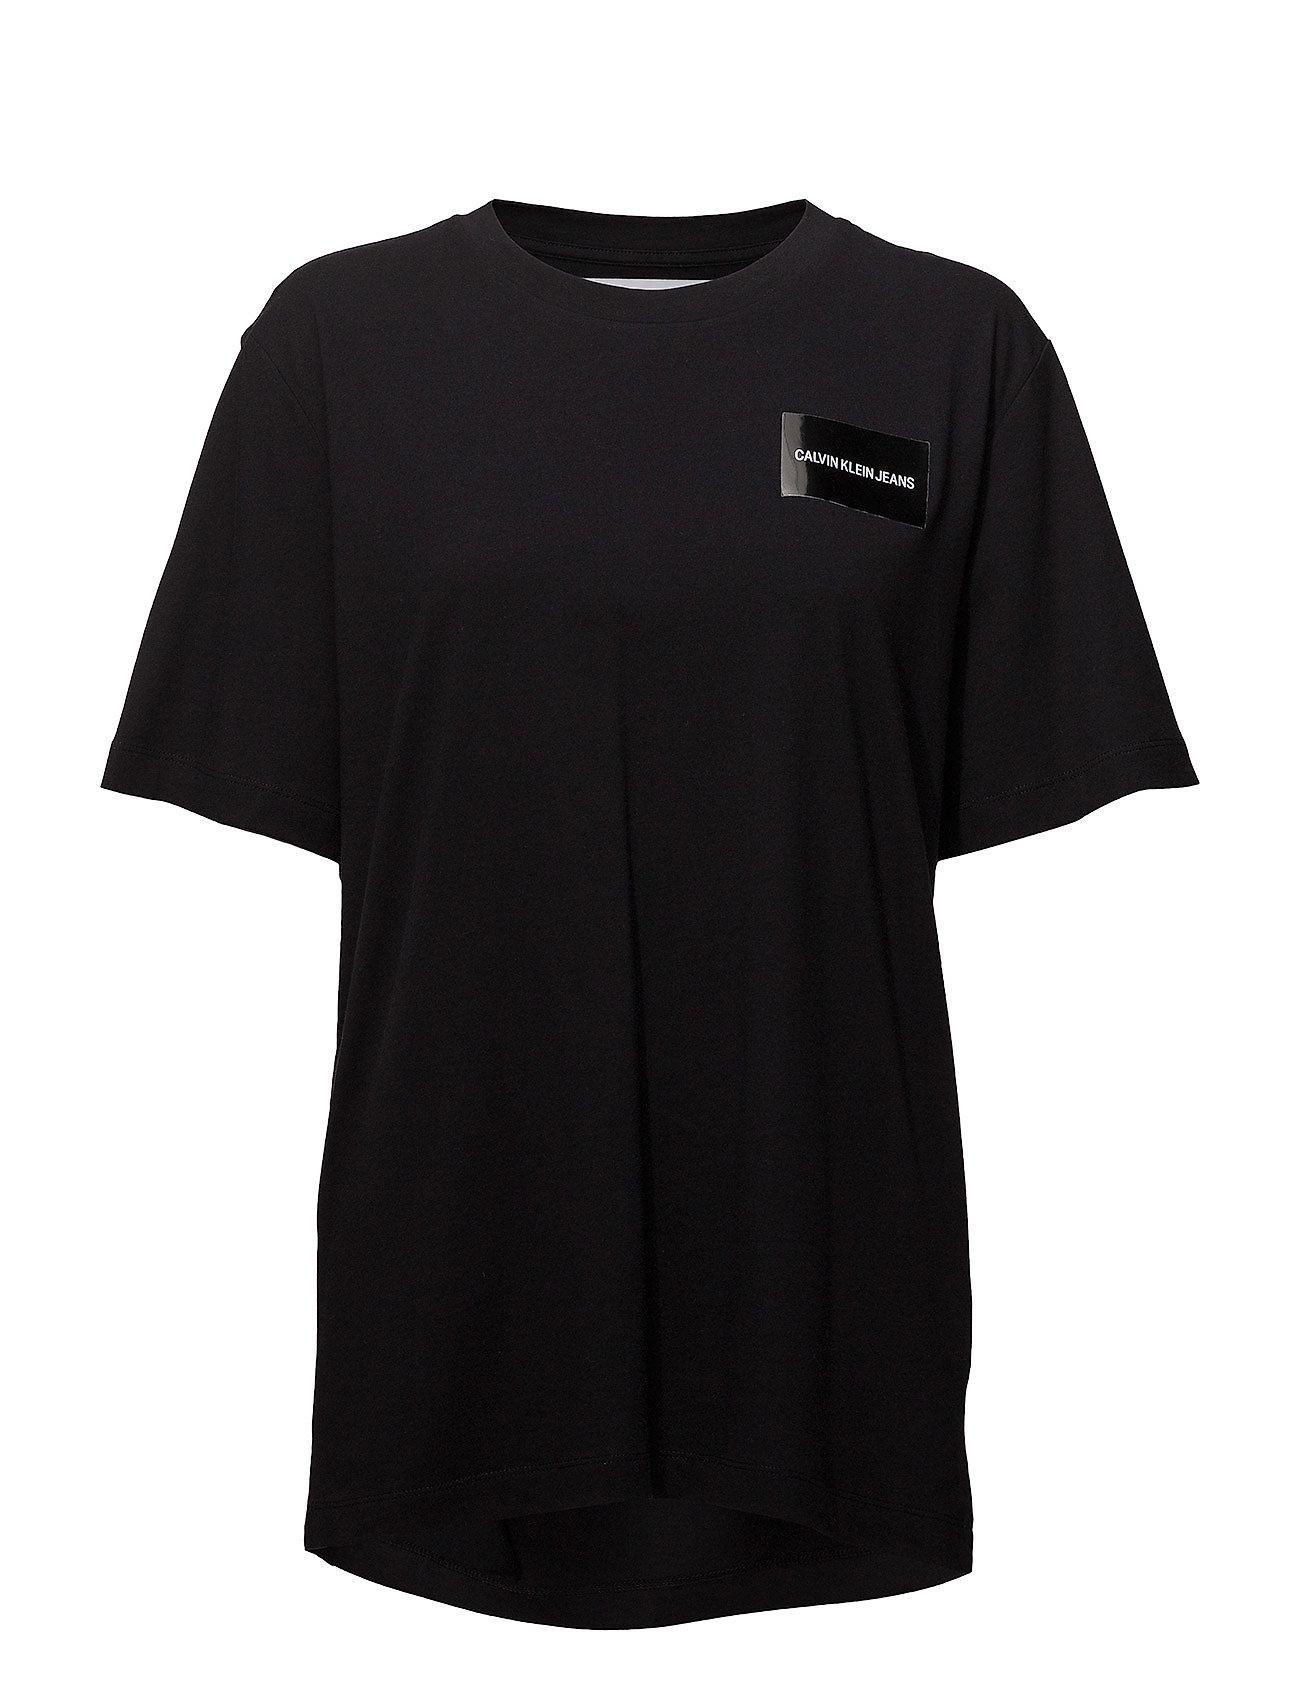 Calvin Klein Jeans GEO SHAPE BOYFRIEND FIT TEE - CK BLACK